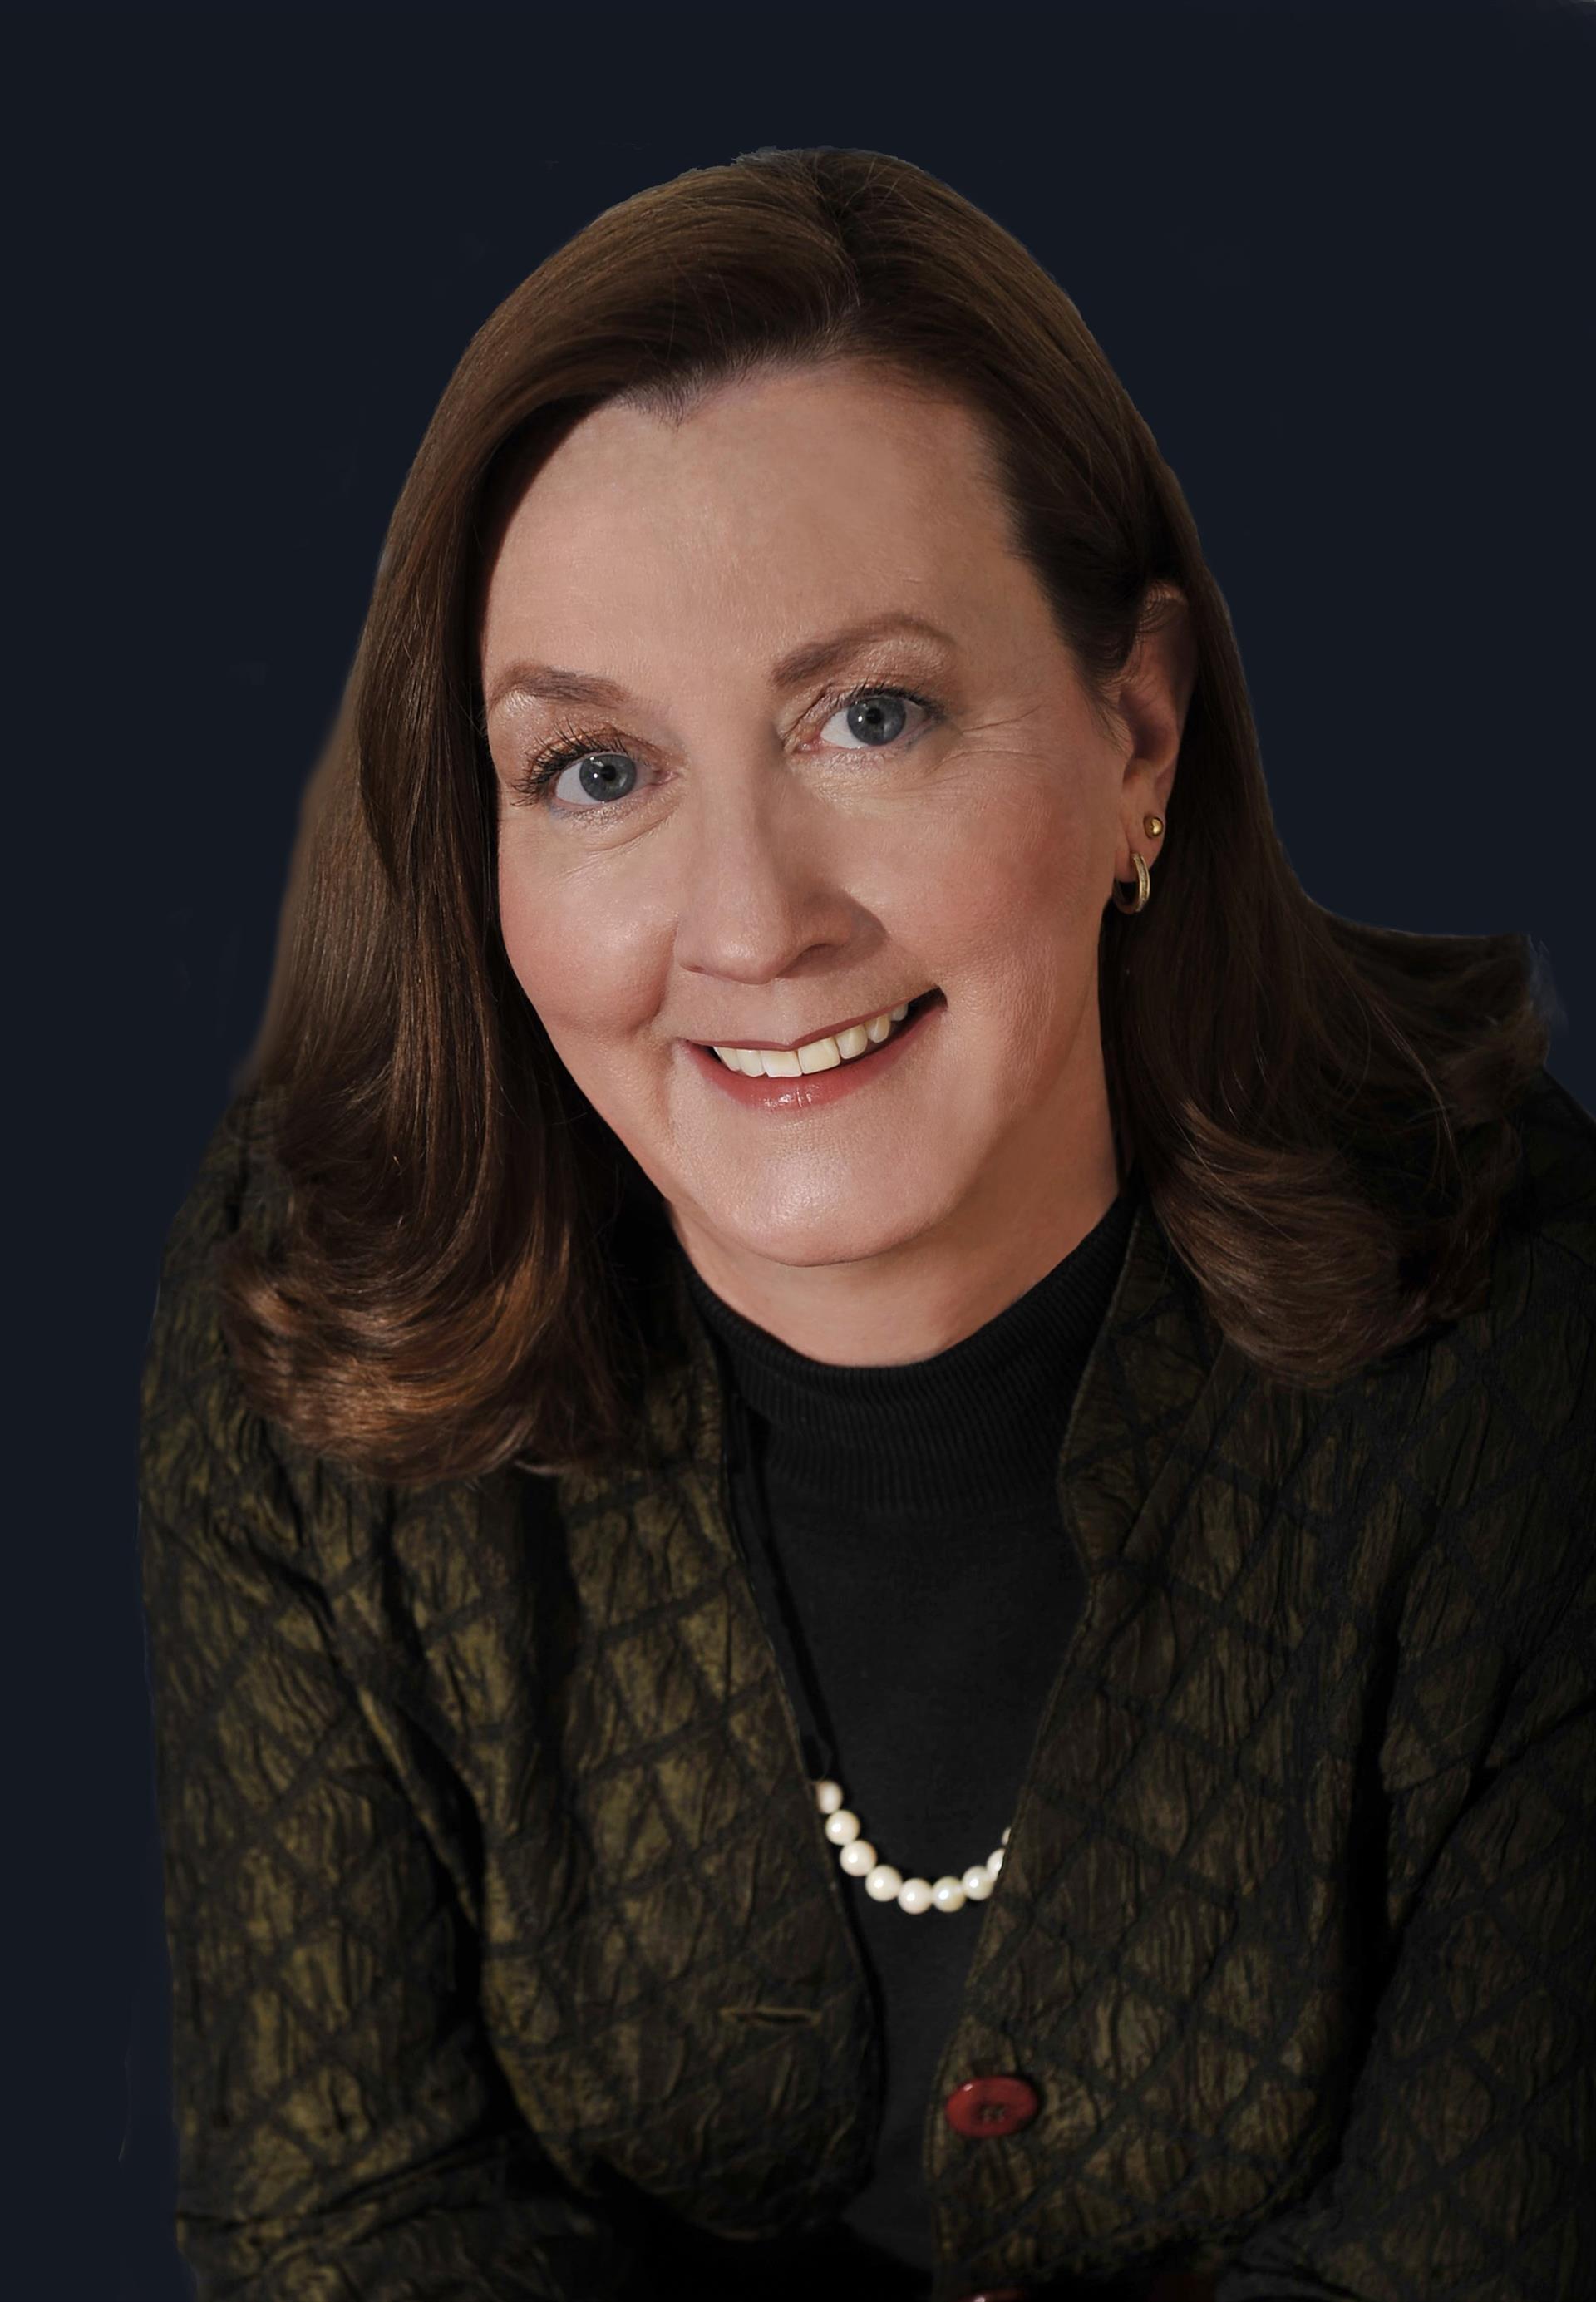 Teresa Gilbreath